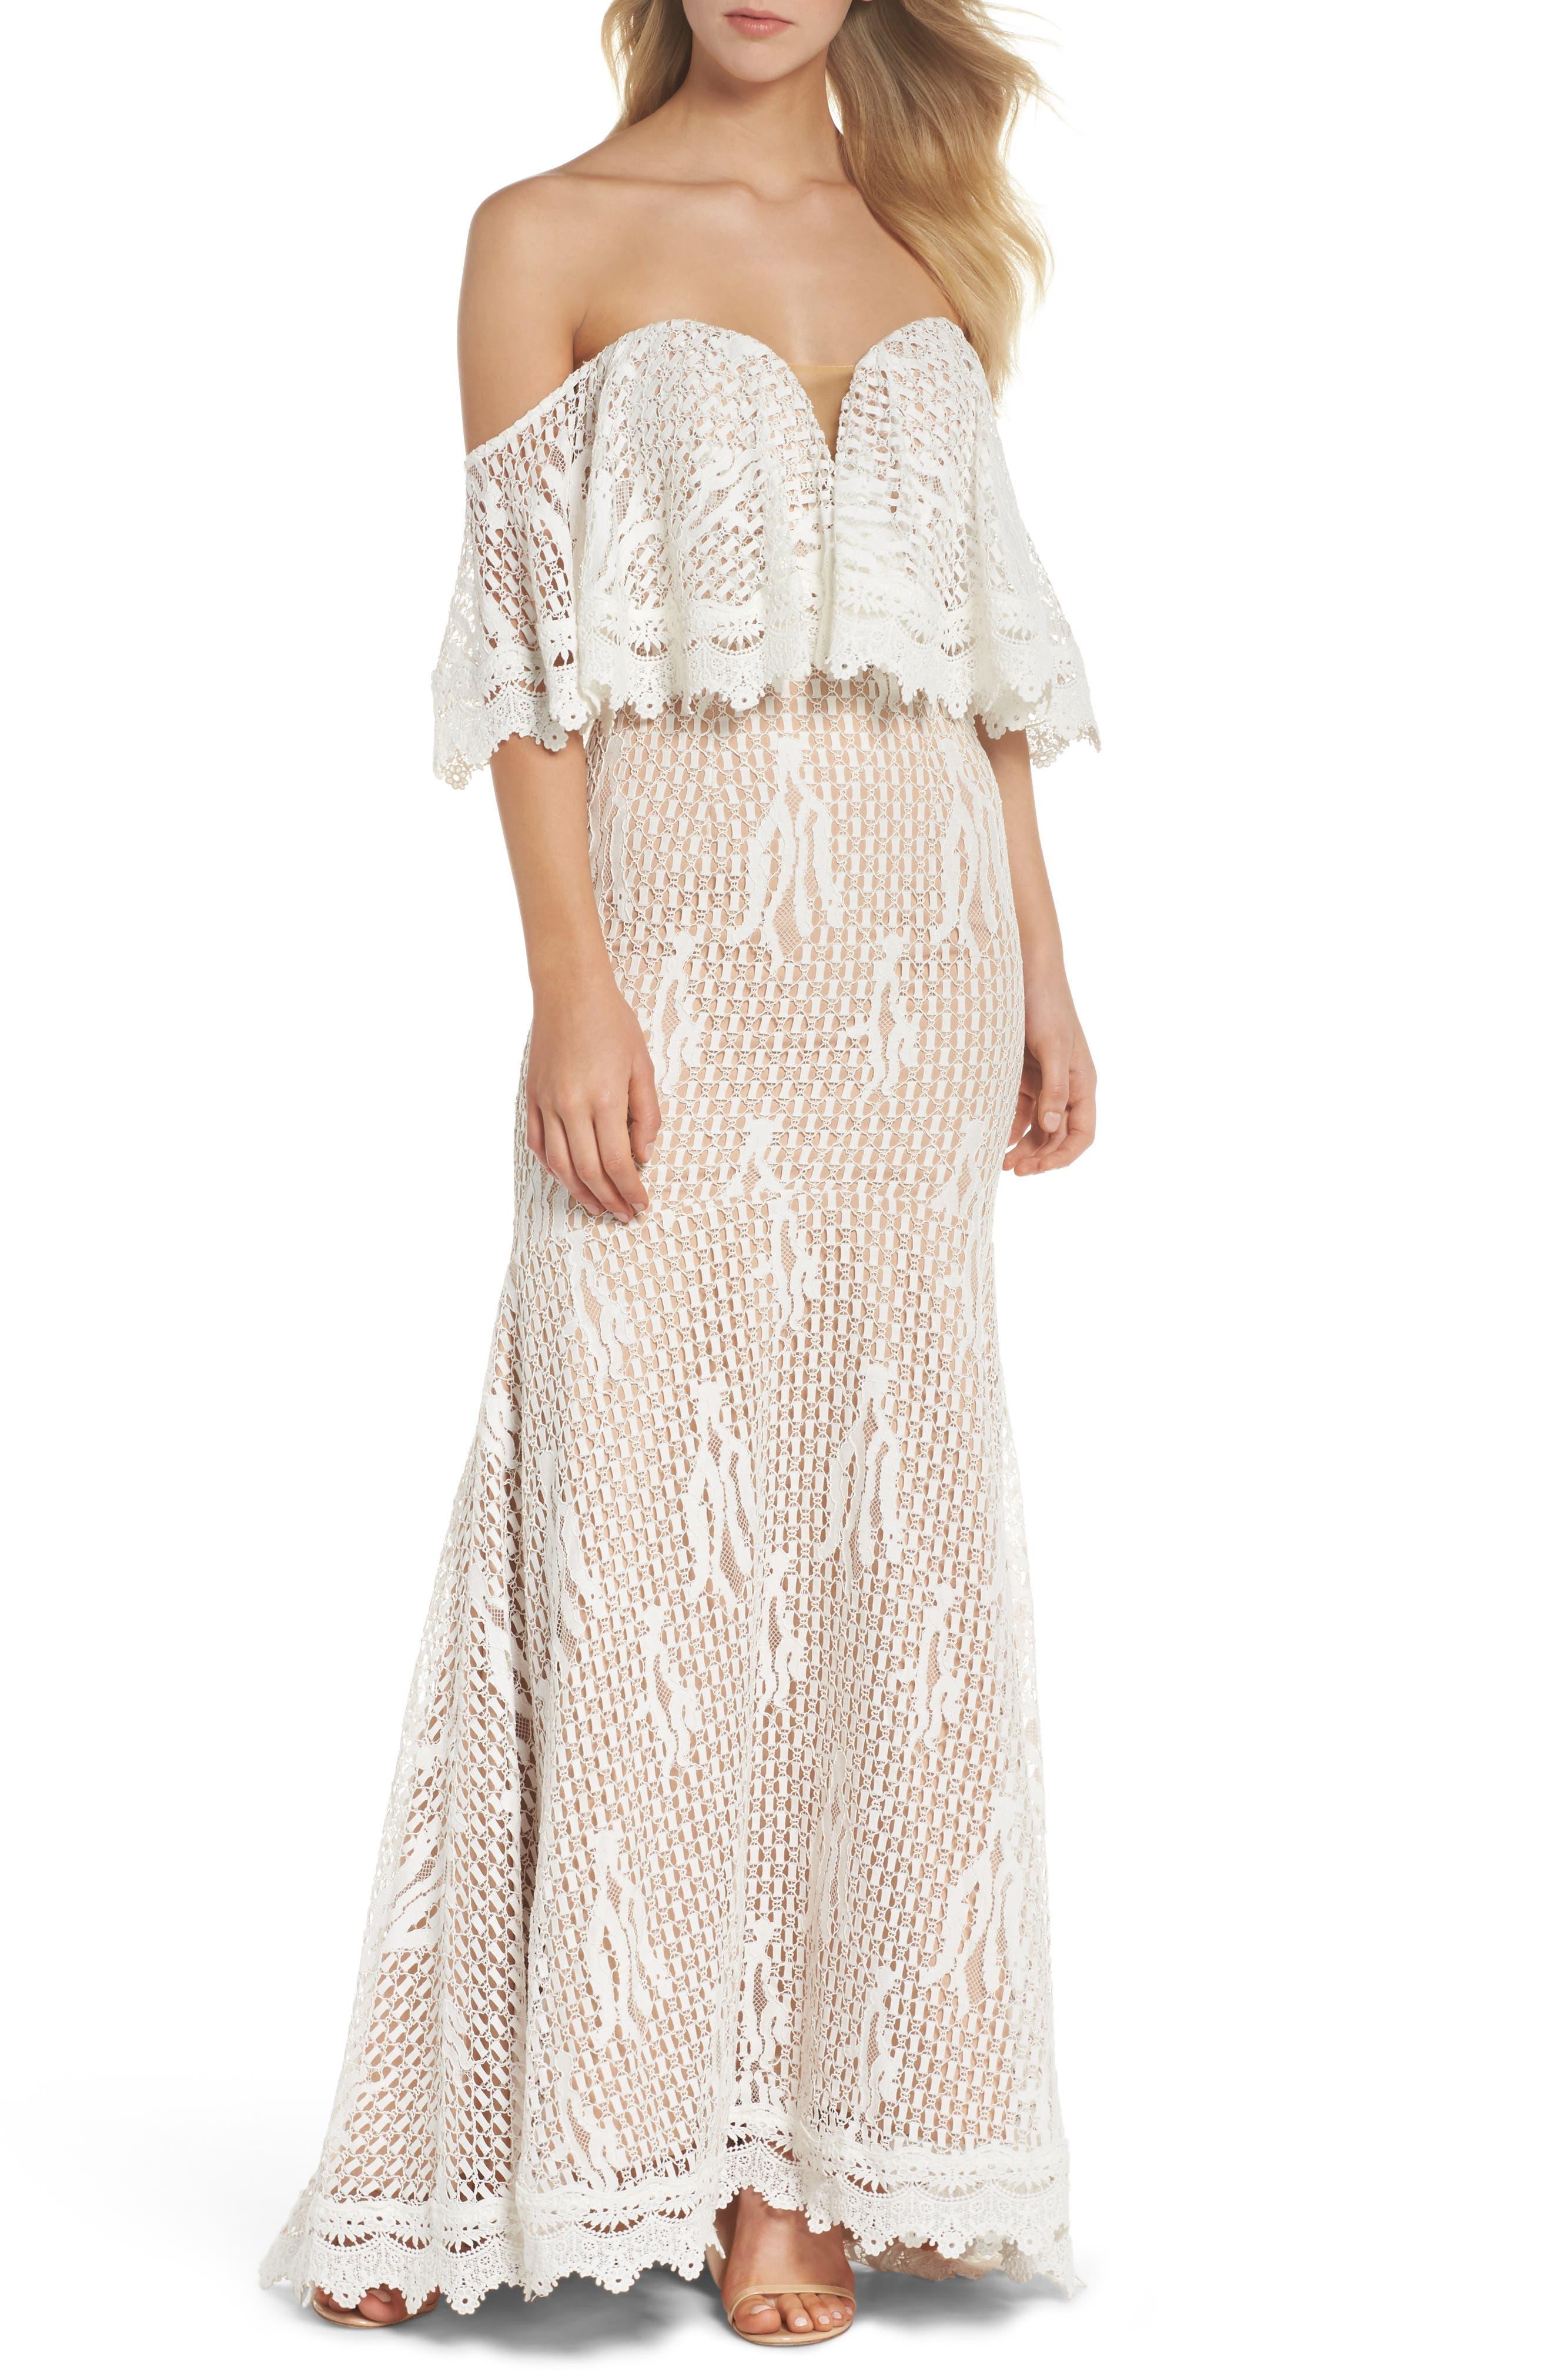 Davilea Off the Shoulder Lace Gown,                             Main thumbnail 1, color,                             Ivory